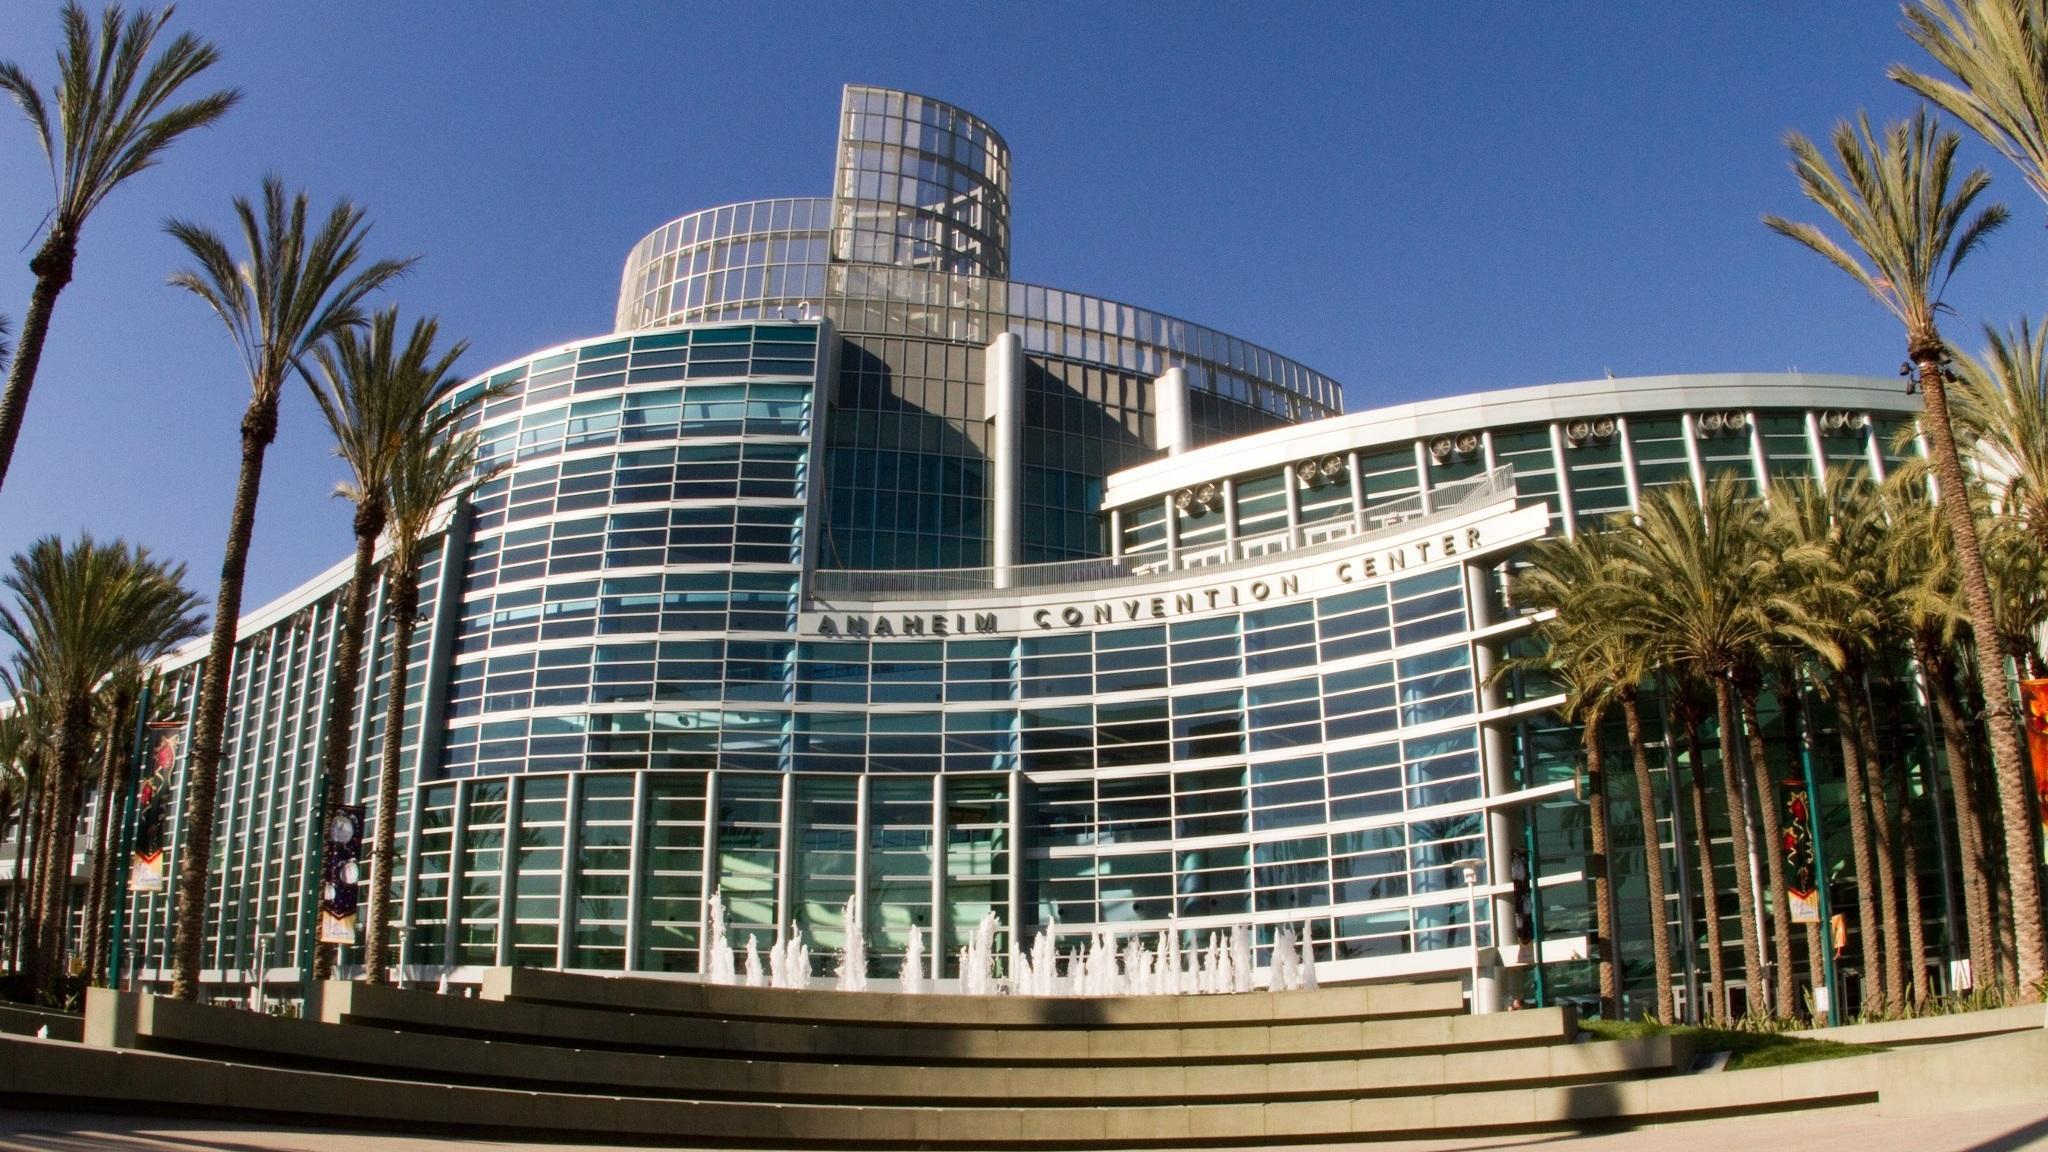 Anaheim Convention Center.png